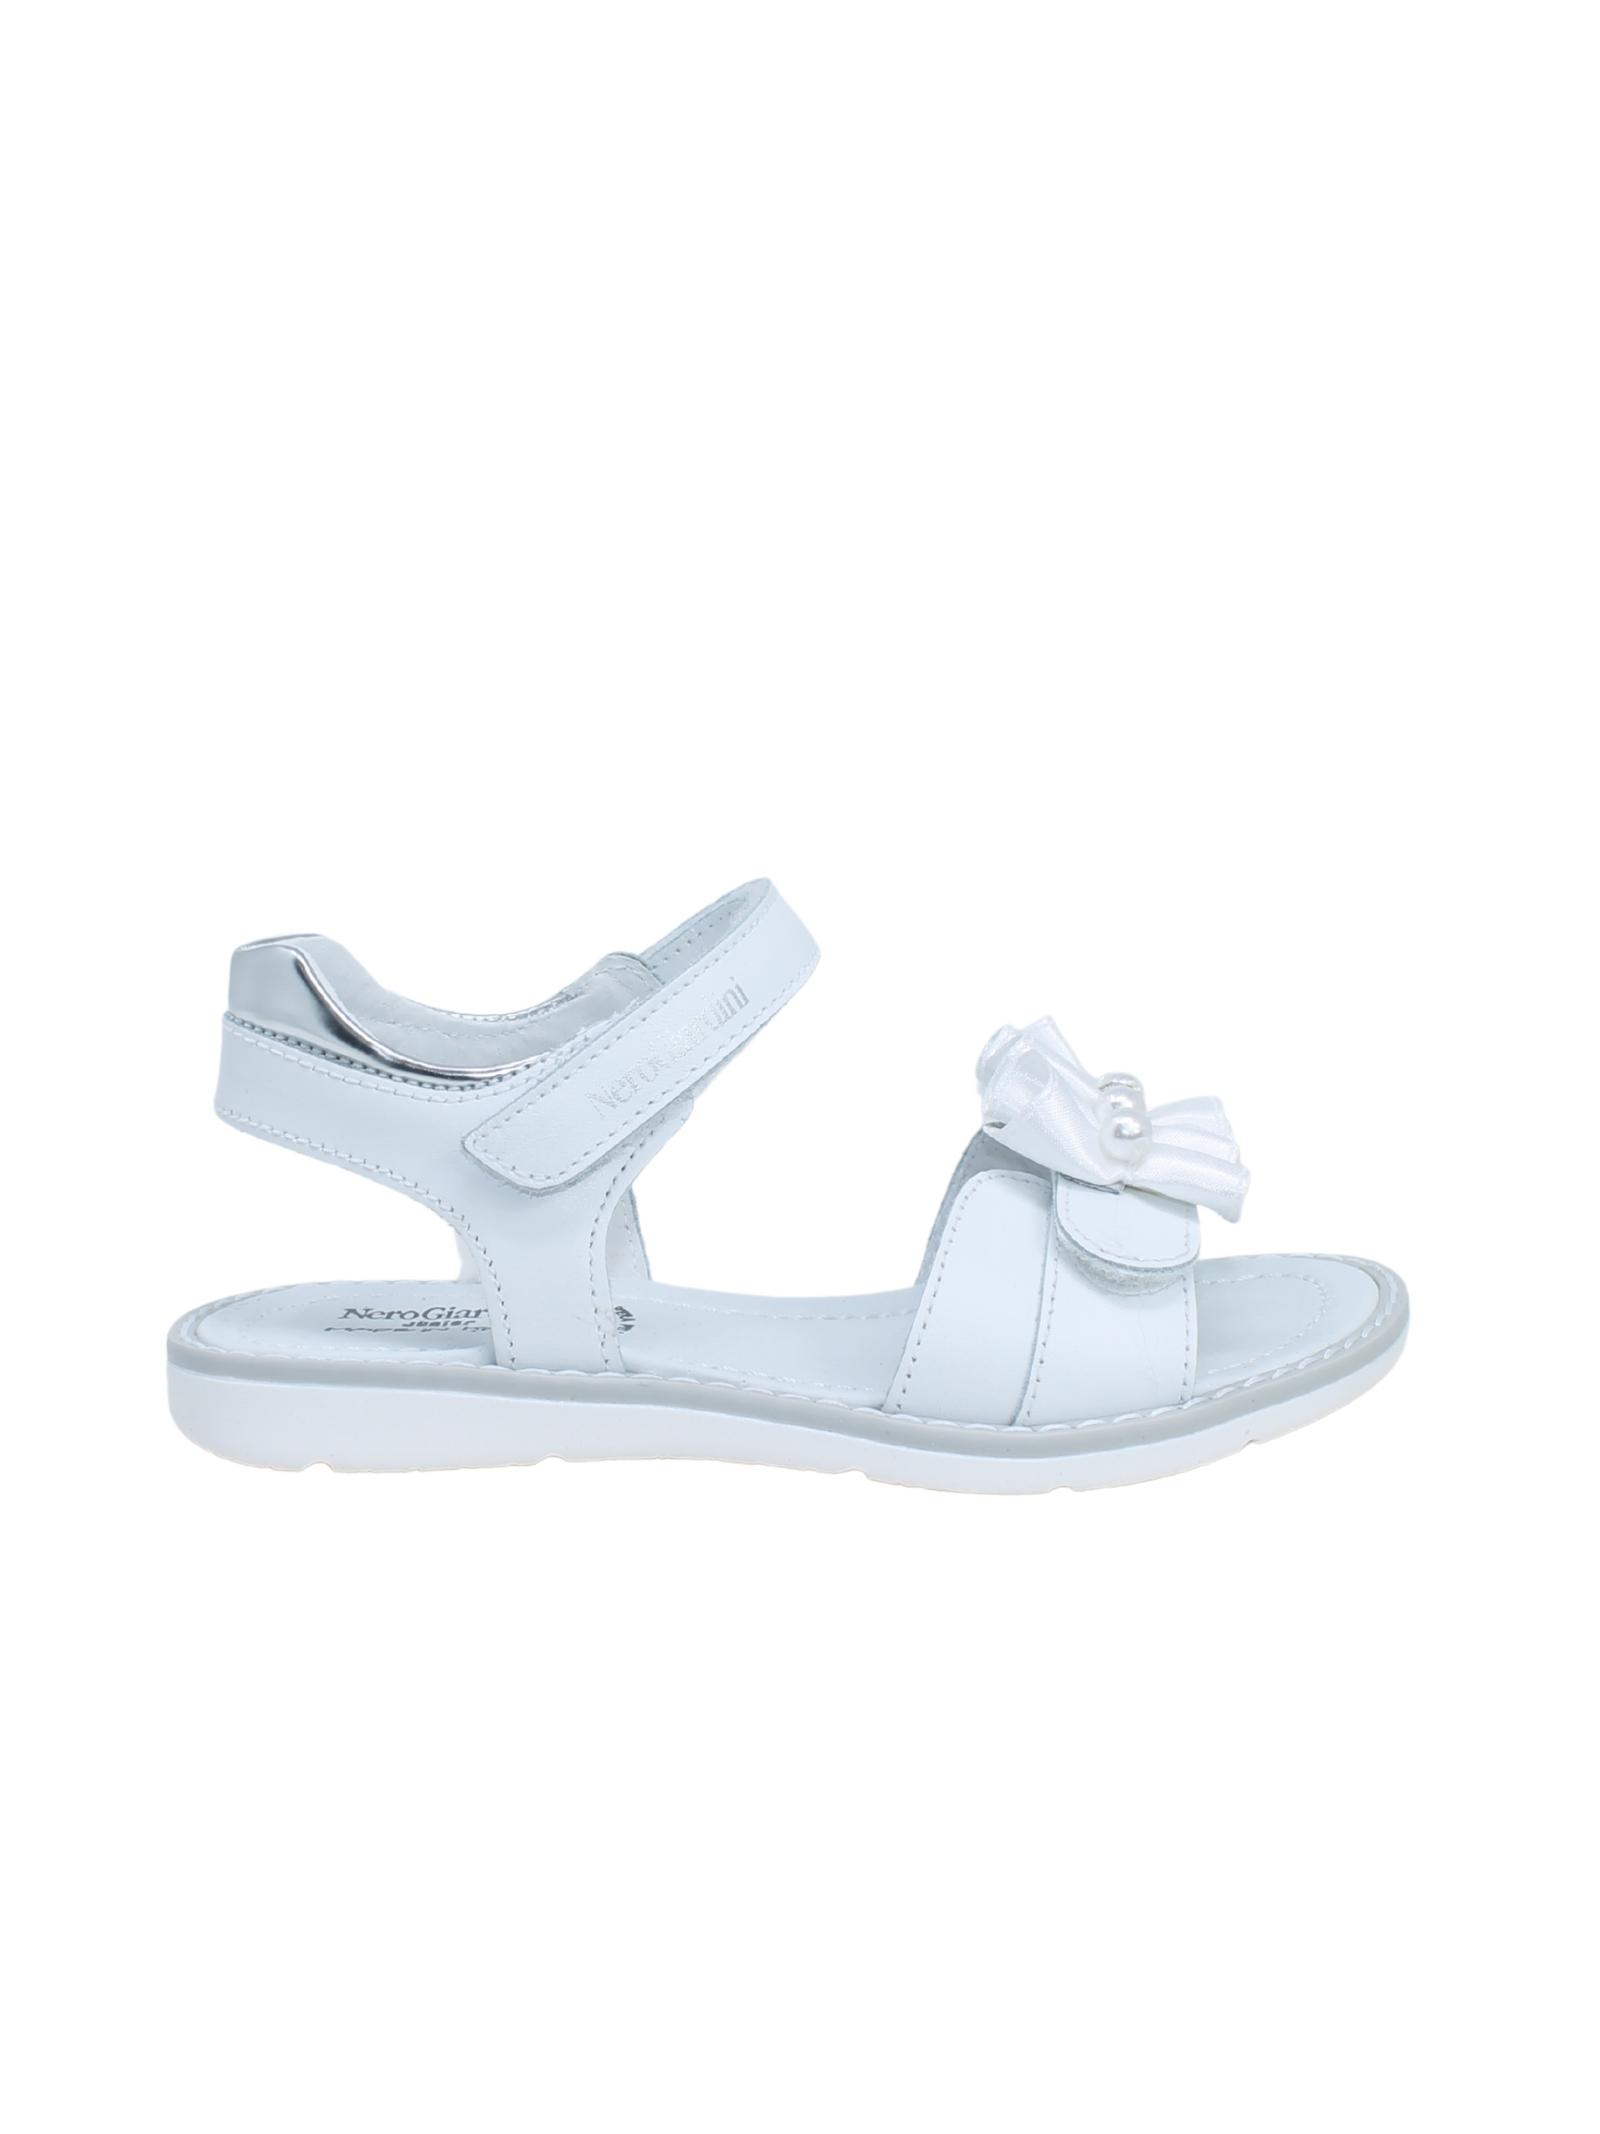 Sandalo Bambina Perle NERO GIARDINI JUNIOR | Sandali | E128160F707